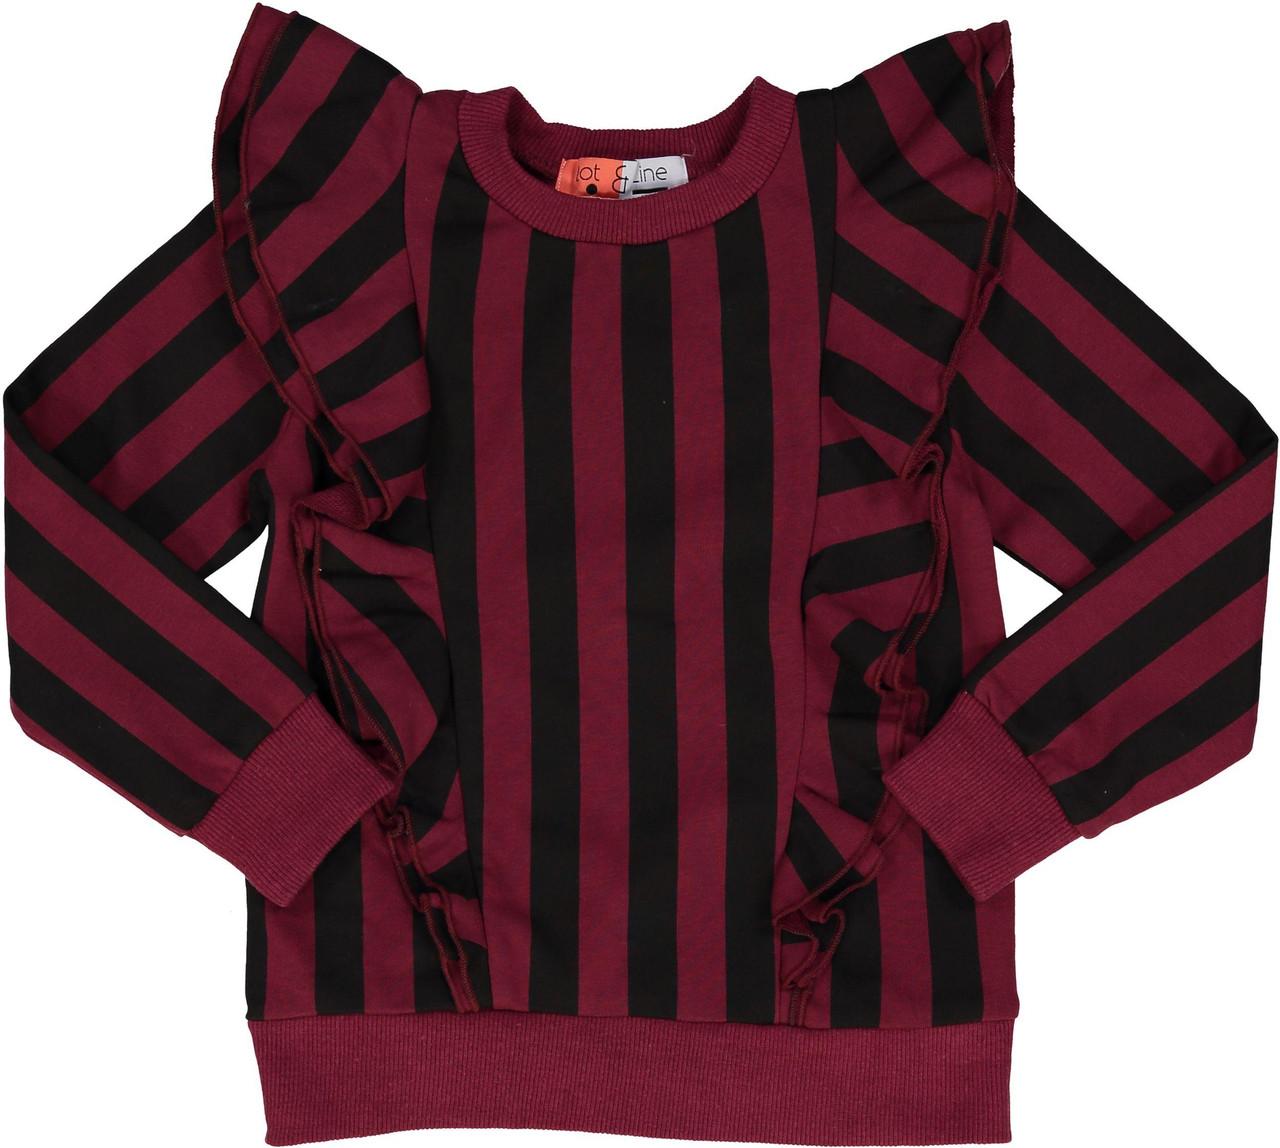 Dot & Line Girls Striped Sweatshirt - DW1933-A